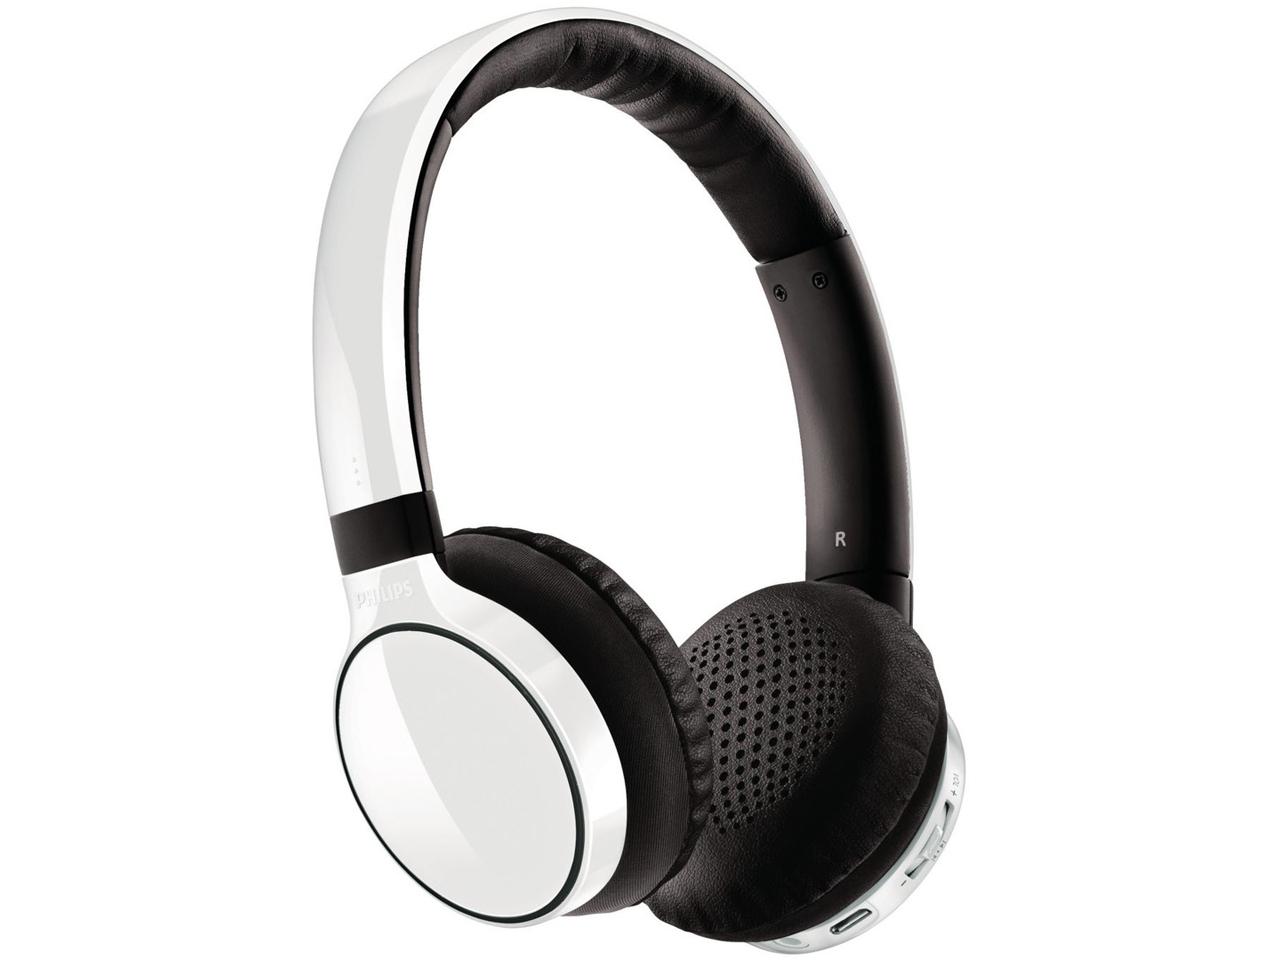 Auriculares inalámbricos Bluetooth Philips SHB9100 color blanco